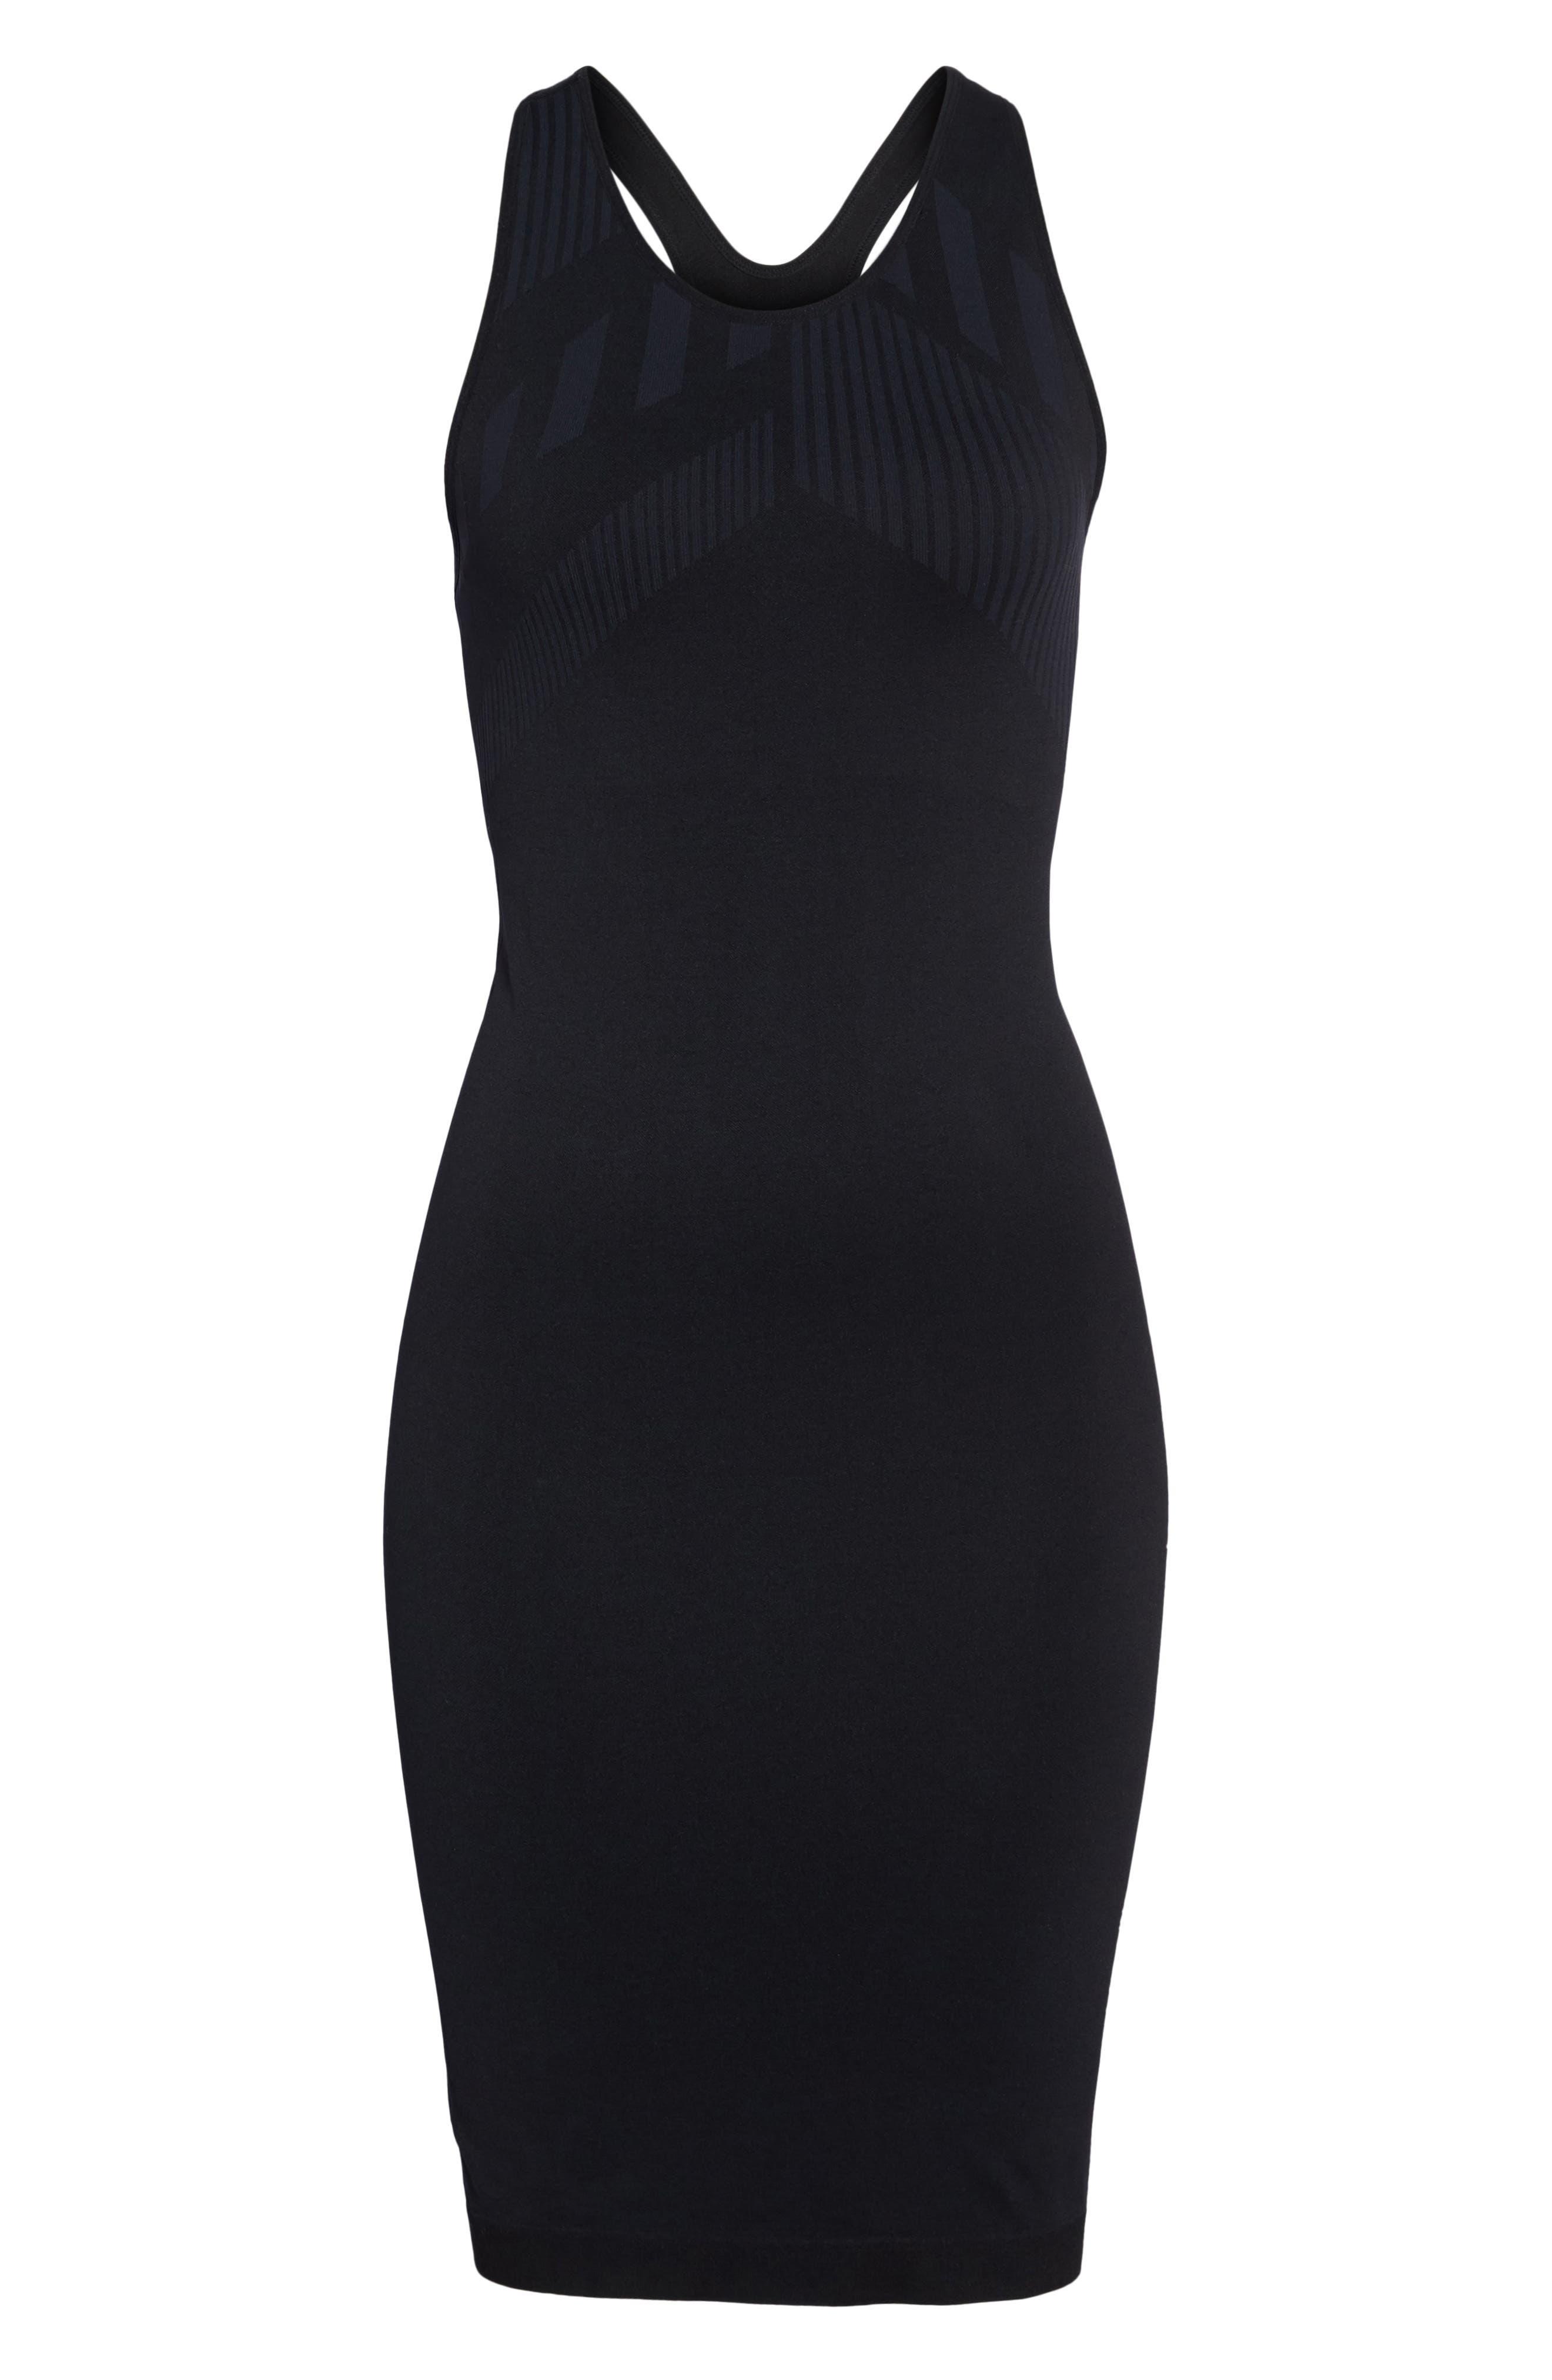 Spectrum Dress,                             Alternate thumbnail 6, color,                             Black